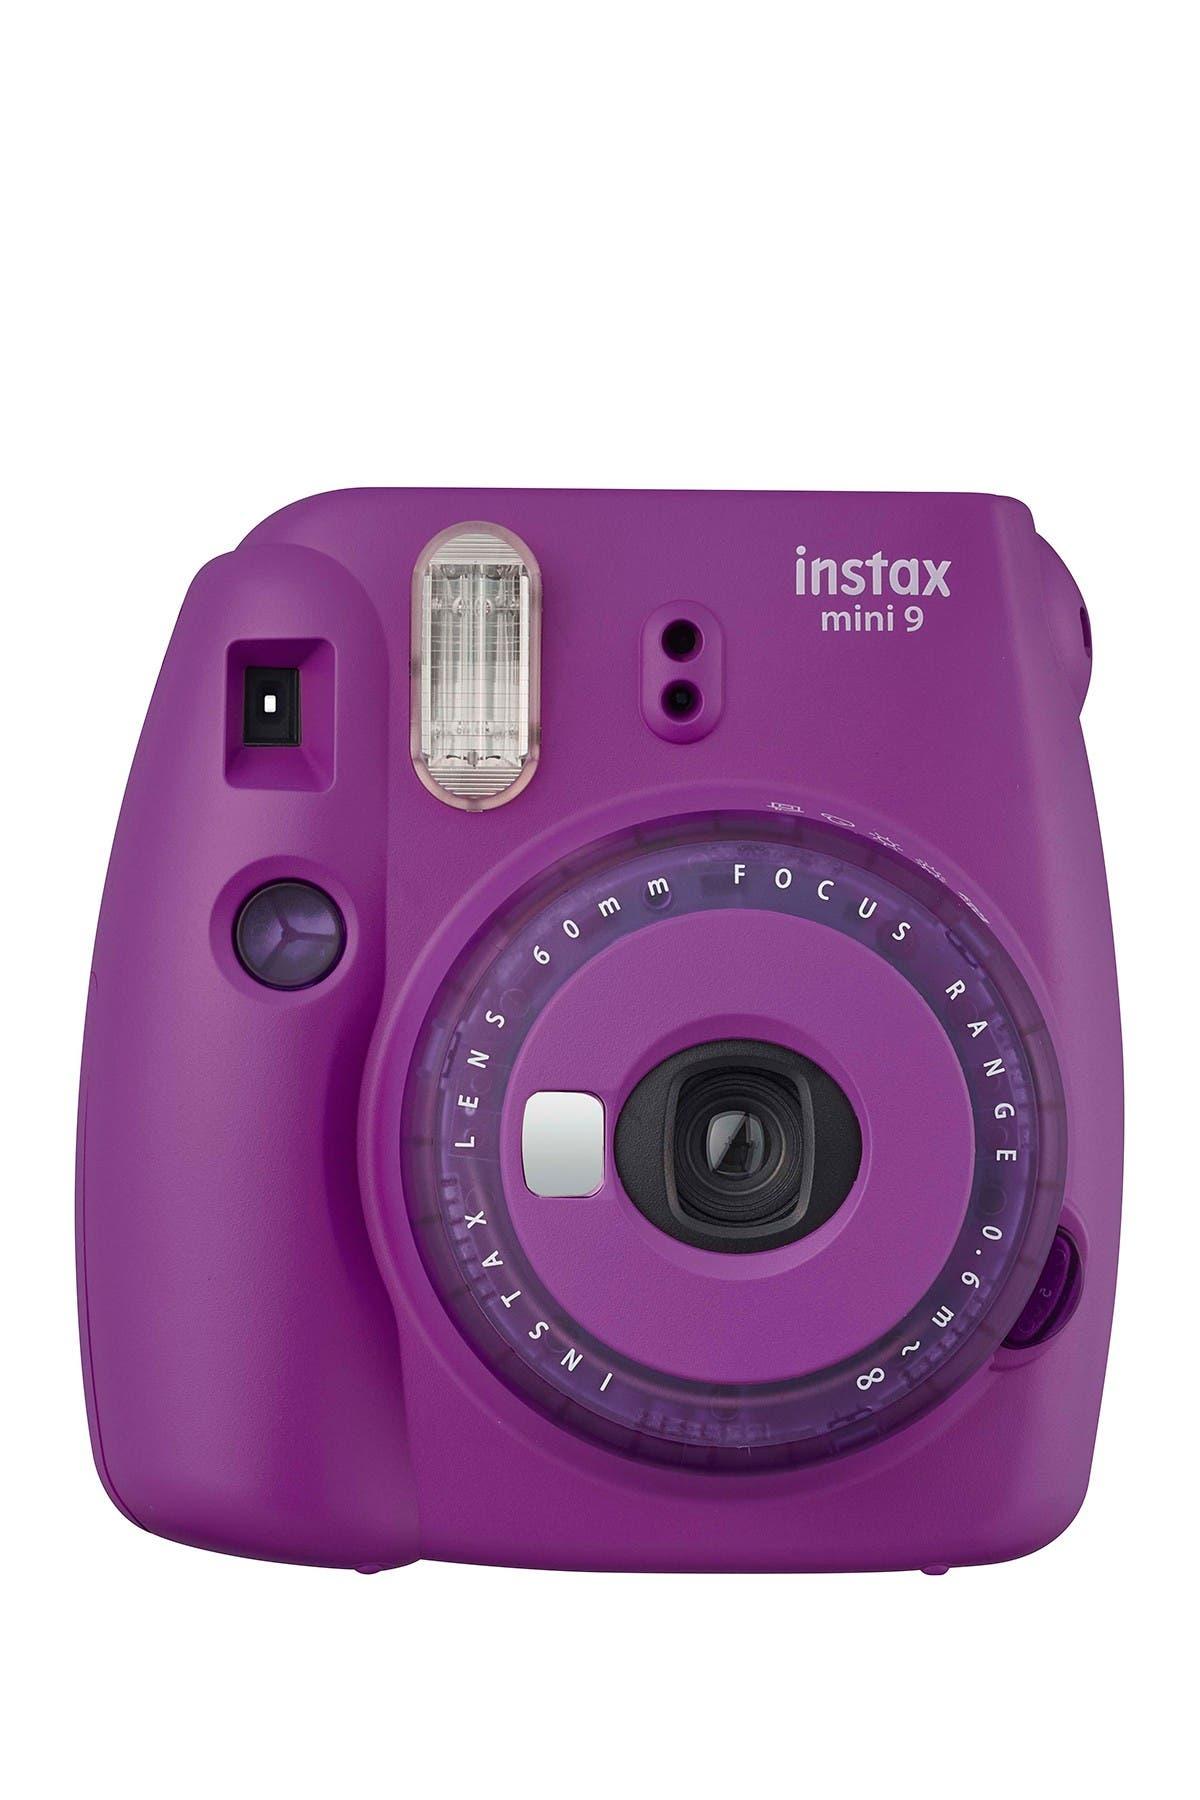 Image of INSTAX MINI BY FUJIFILM Instax Mini 9 Camera - Purple